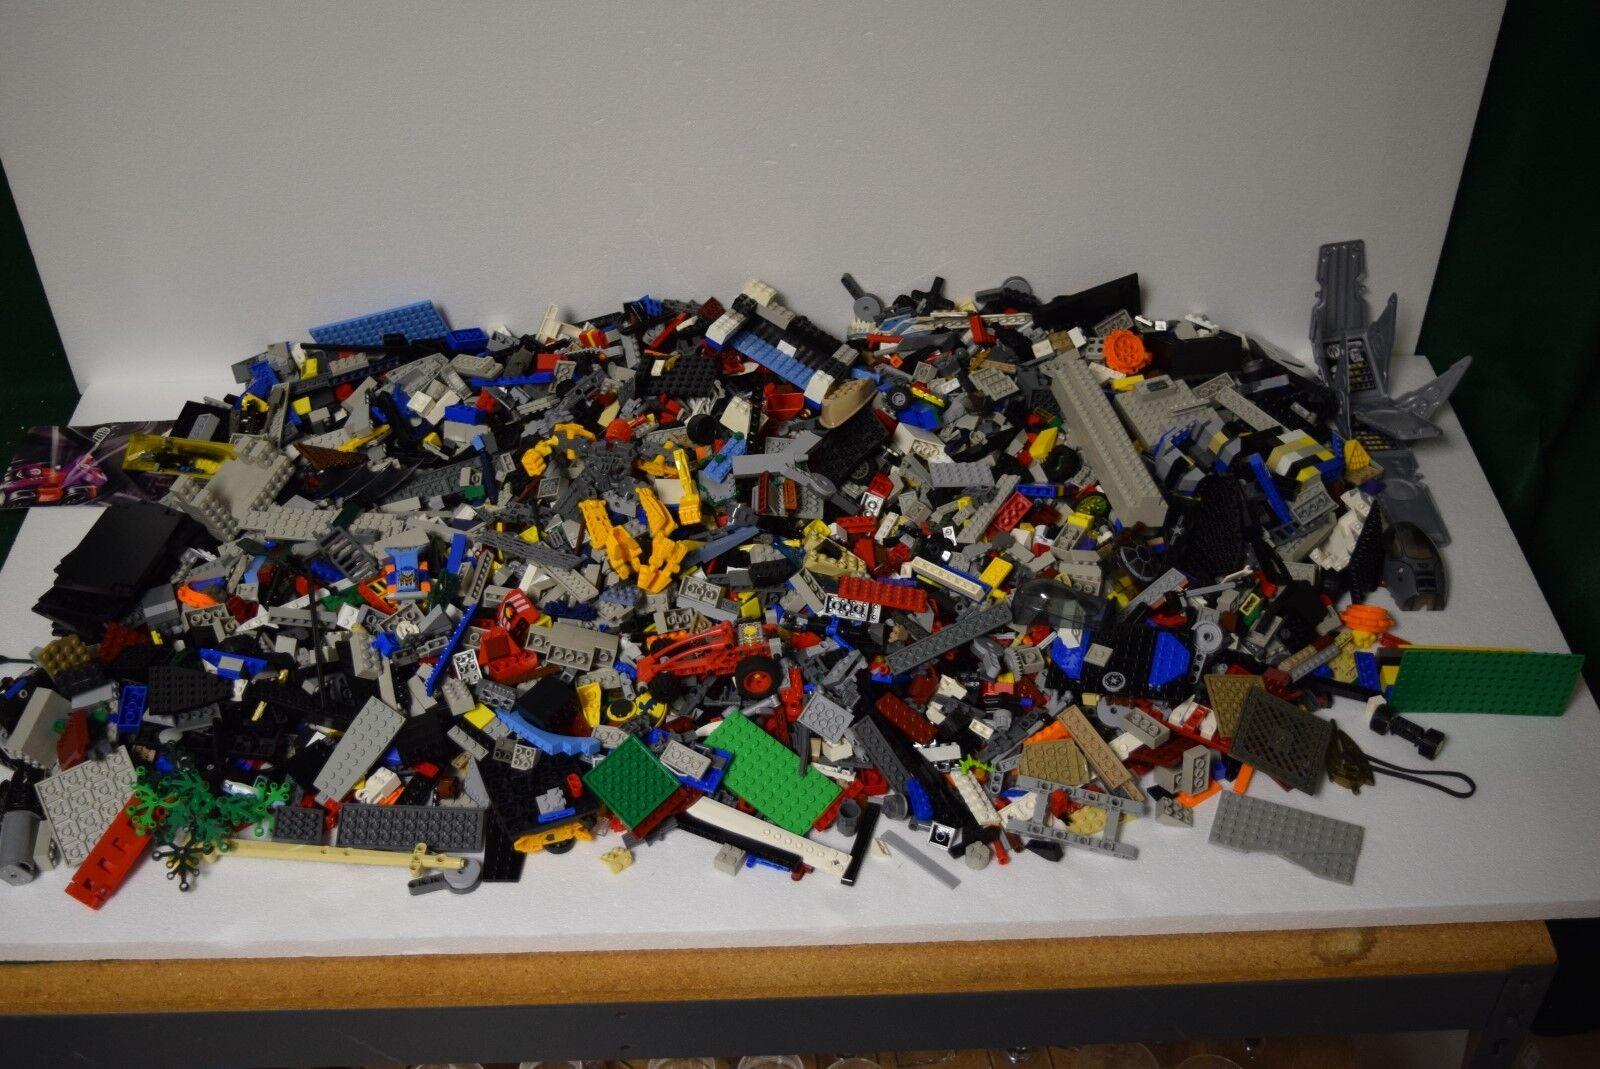 17 Pounds of Legos - LEGO 17 LB